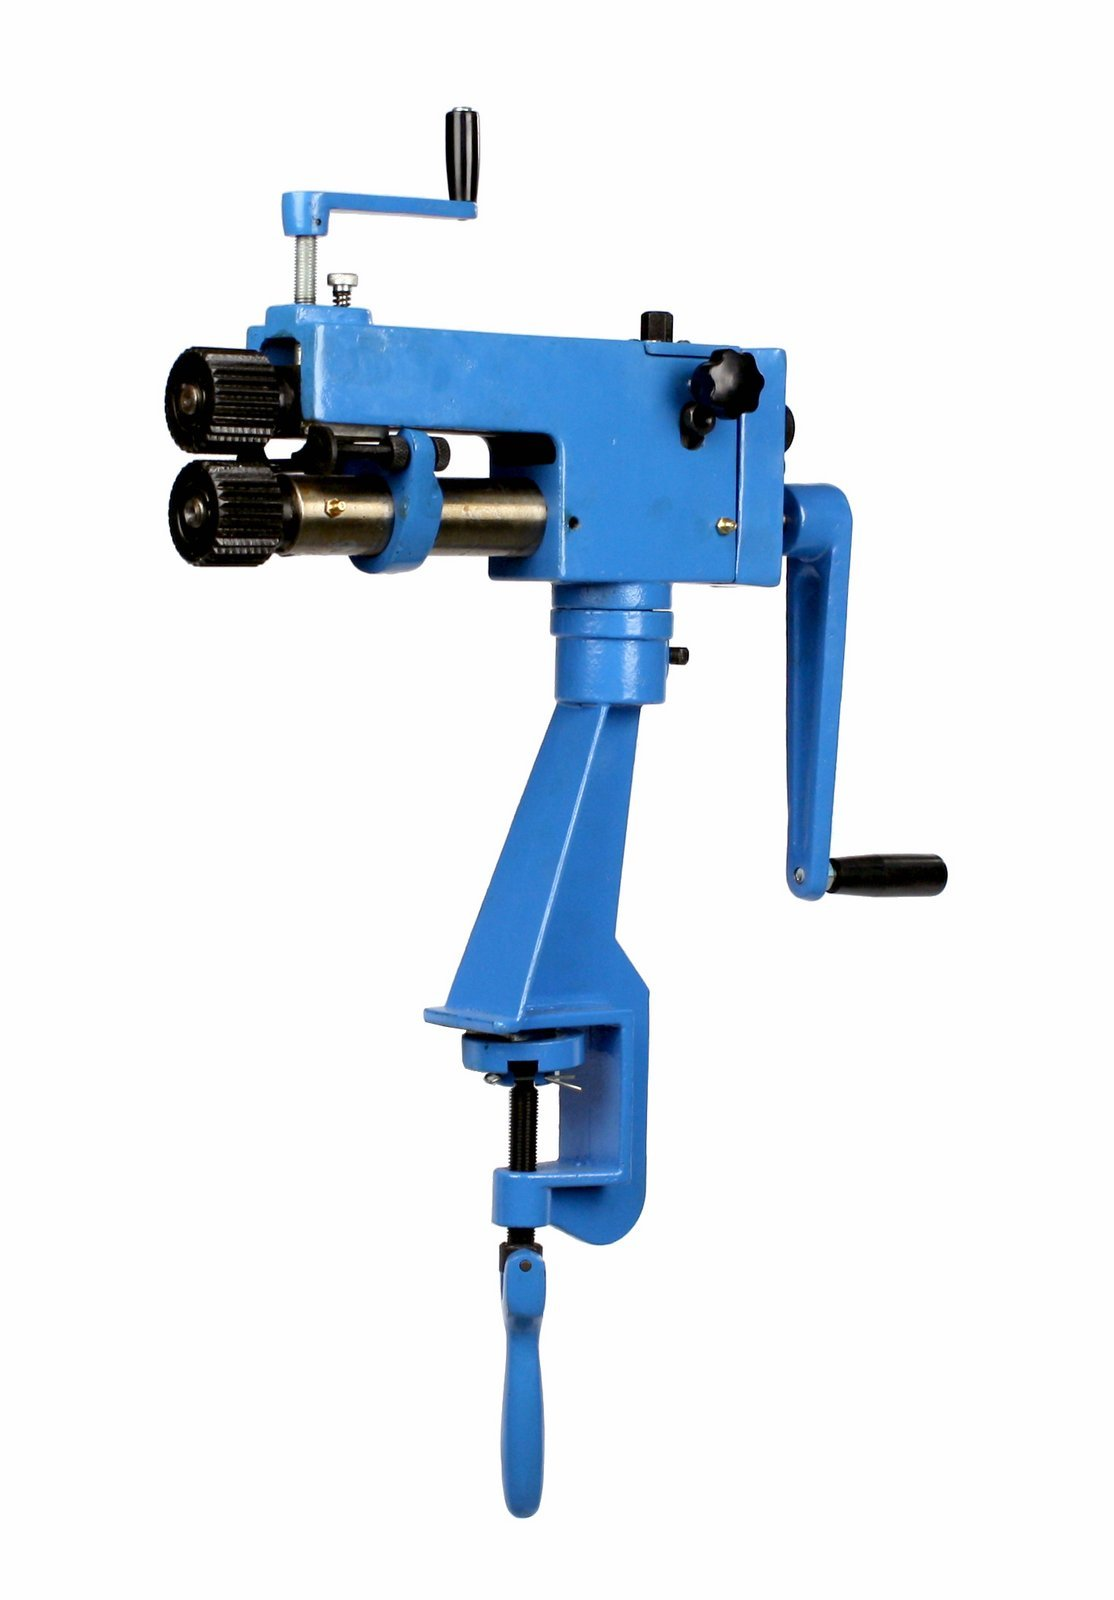 Erie Tools Rotary Machine Bead Roller Sheet Metal Forming & Steel Bender HVAC Fabrication with 22 Gauge Capacity